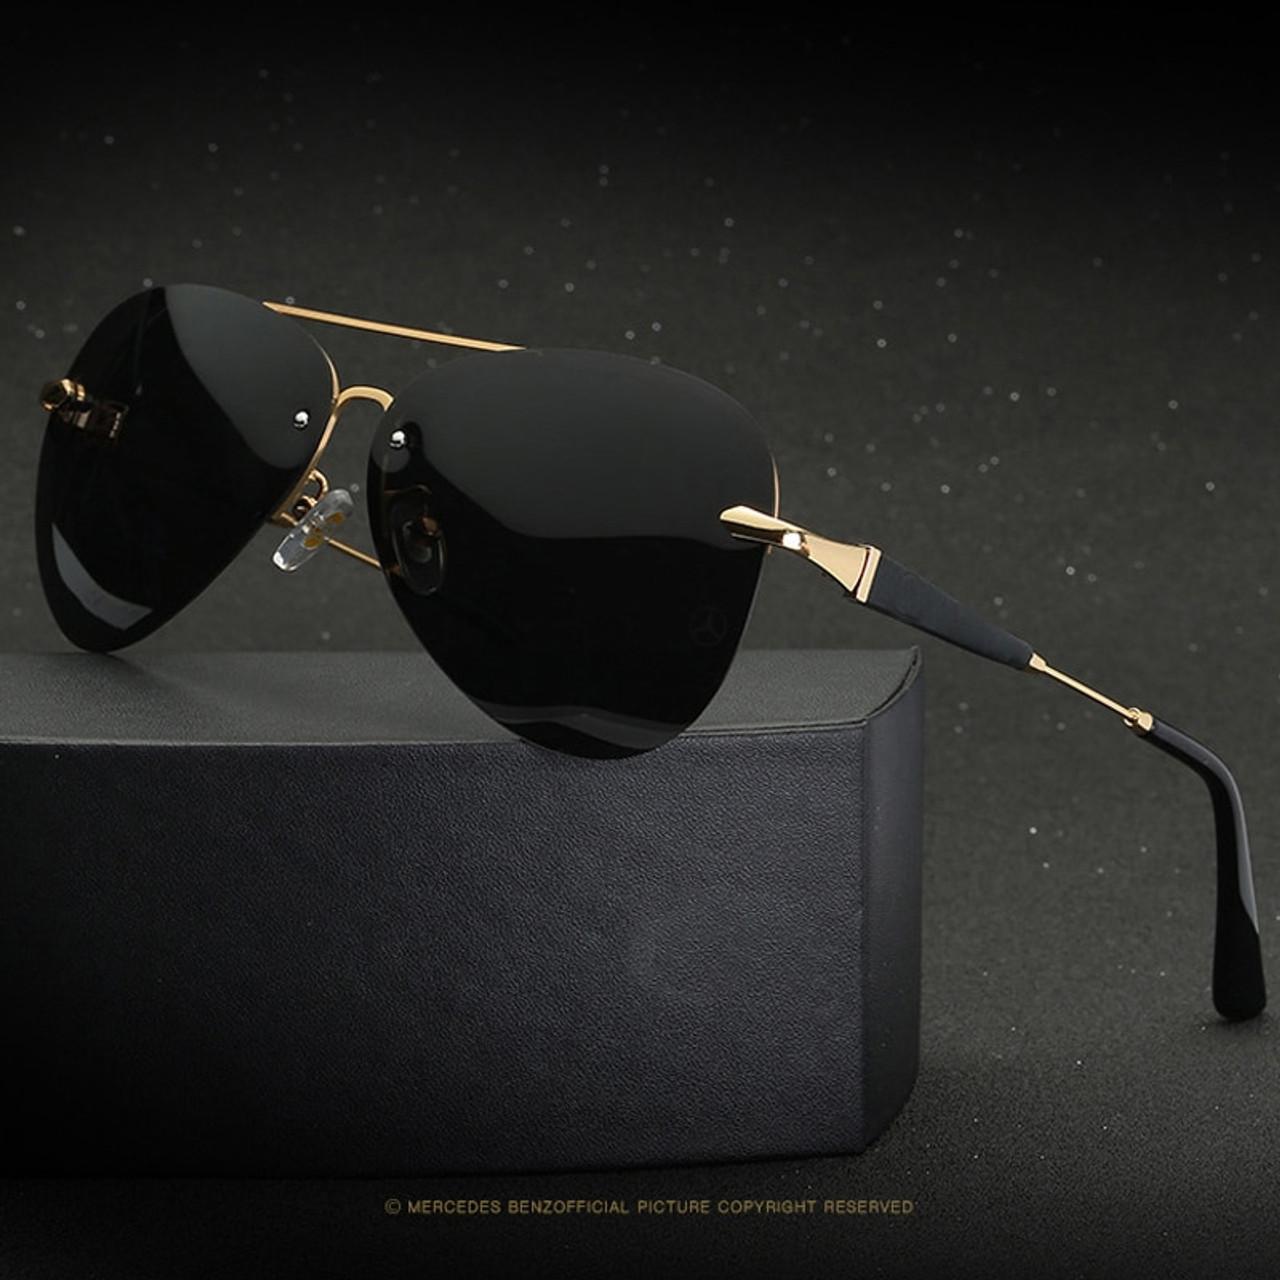 8b07ca503a3 ... 2019 high quality Frameless Polarized Sunglasses Men uv400 Brand  Designer Oculos De Sol Driving Fishing Sun ...